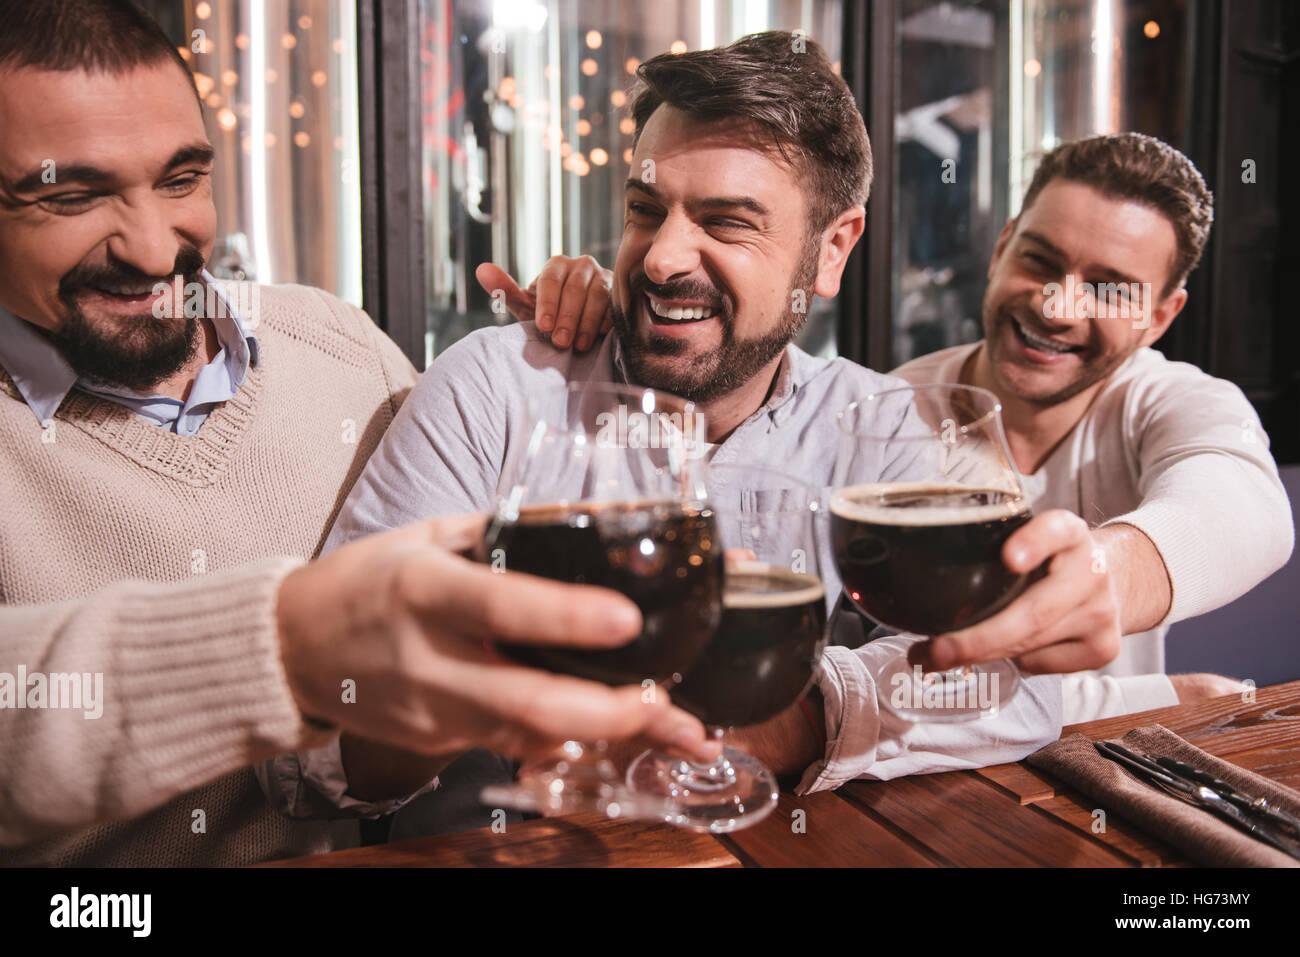 Joyful delighted men drinking alcohol - Stock Image